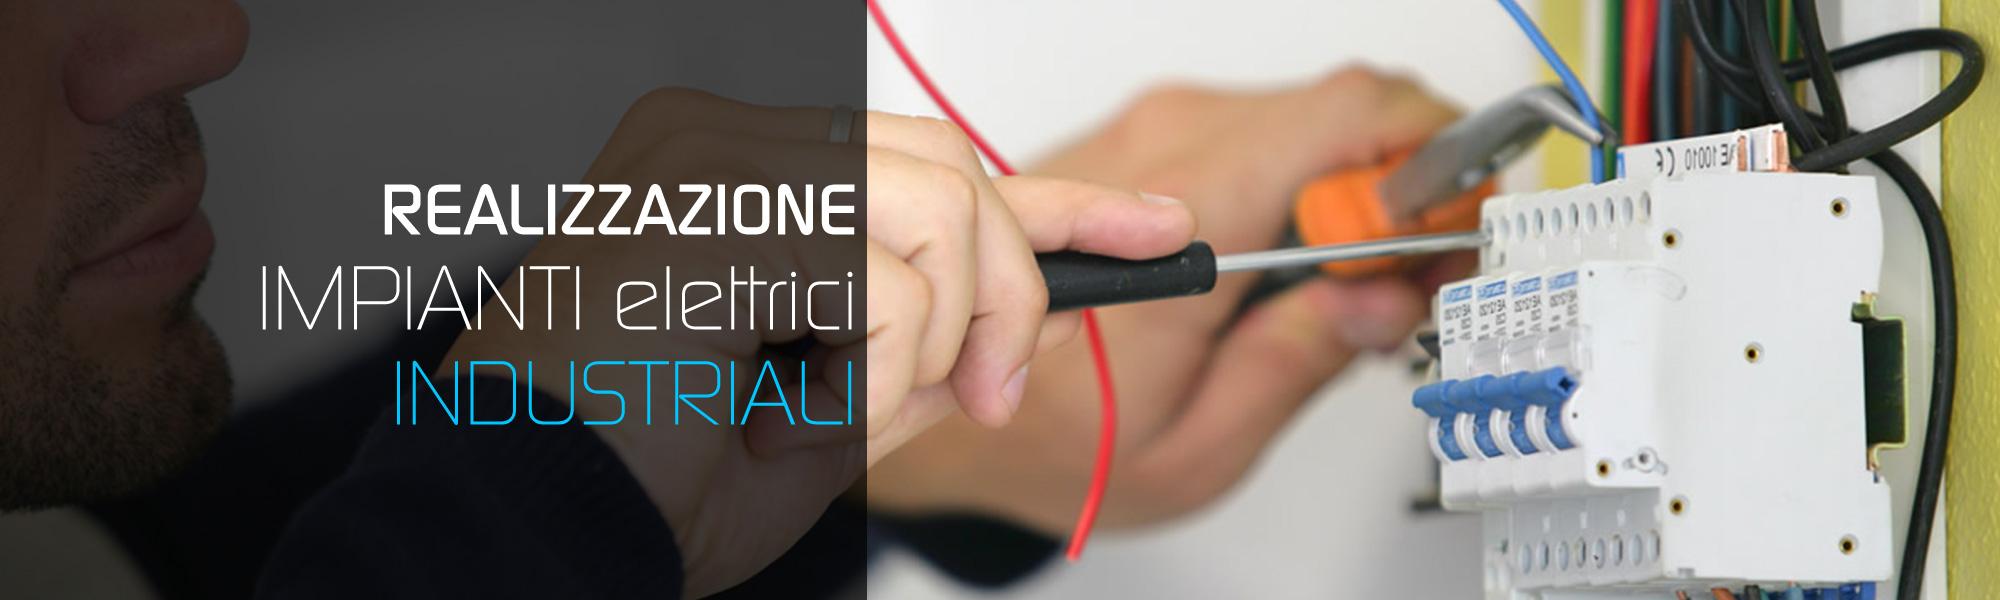 home2-impianti-elettrici-industriali